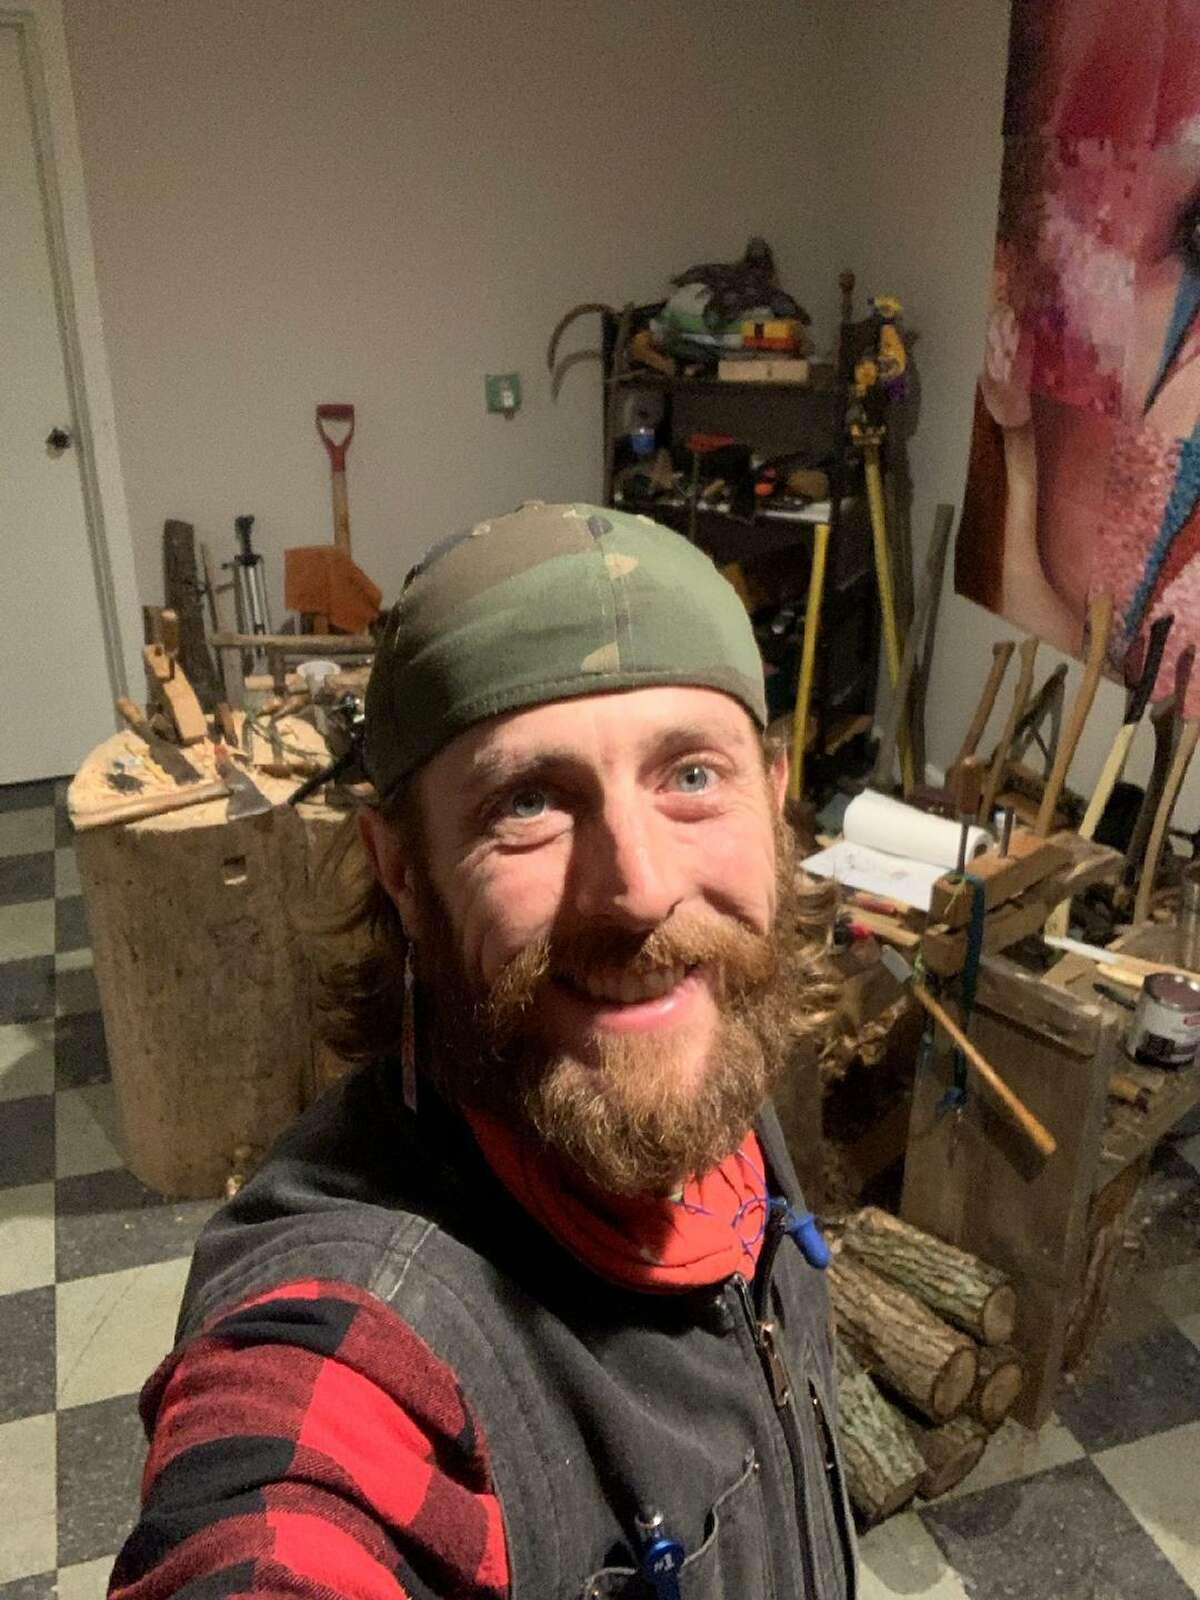 Paul-Robert Blackman is an arborist and wood artist. His studio, Artist's Tree, is opening in March.